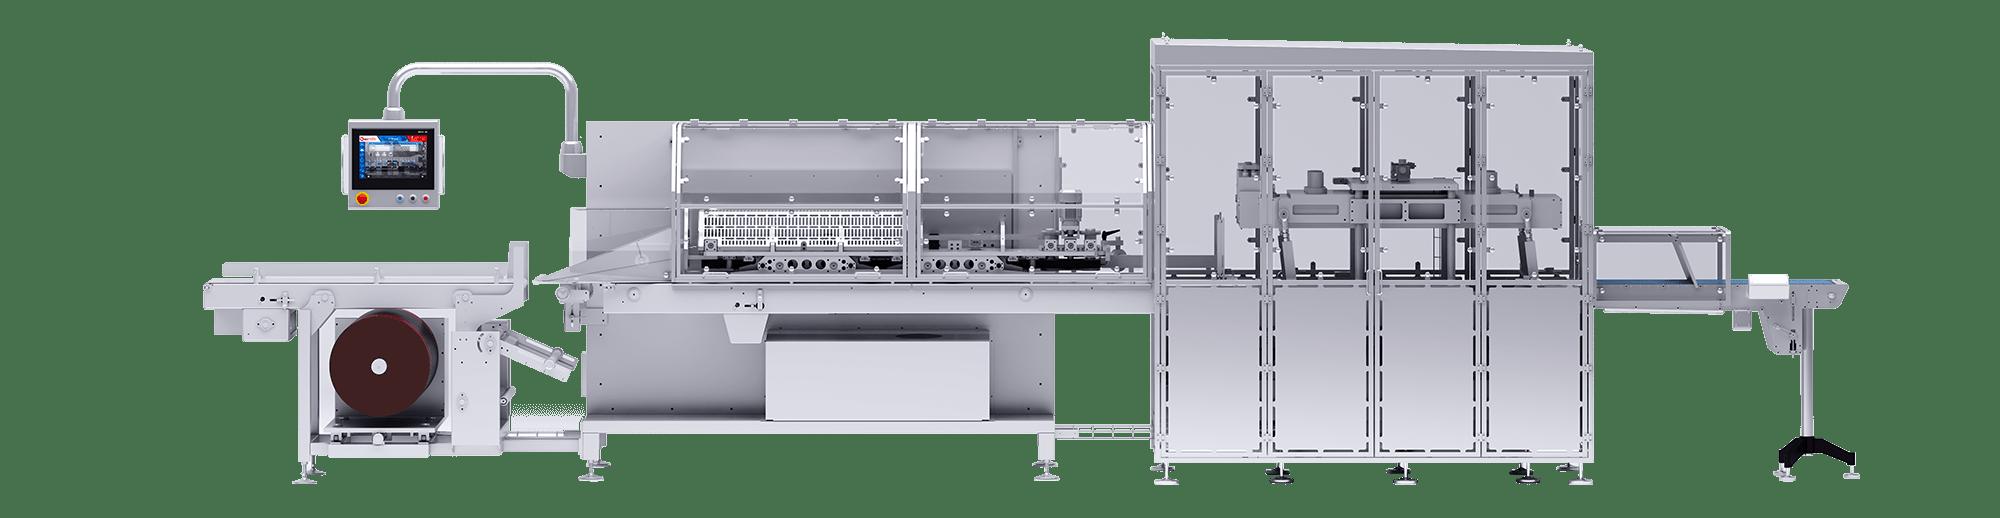 Vacuum chamber machine Omega 800 - Colimatic industrial vacuum chamber machine